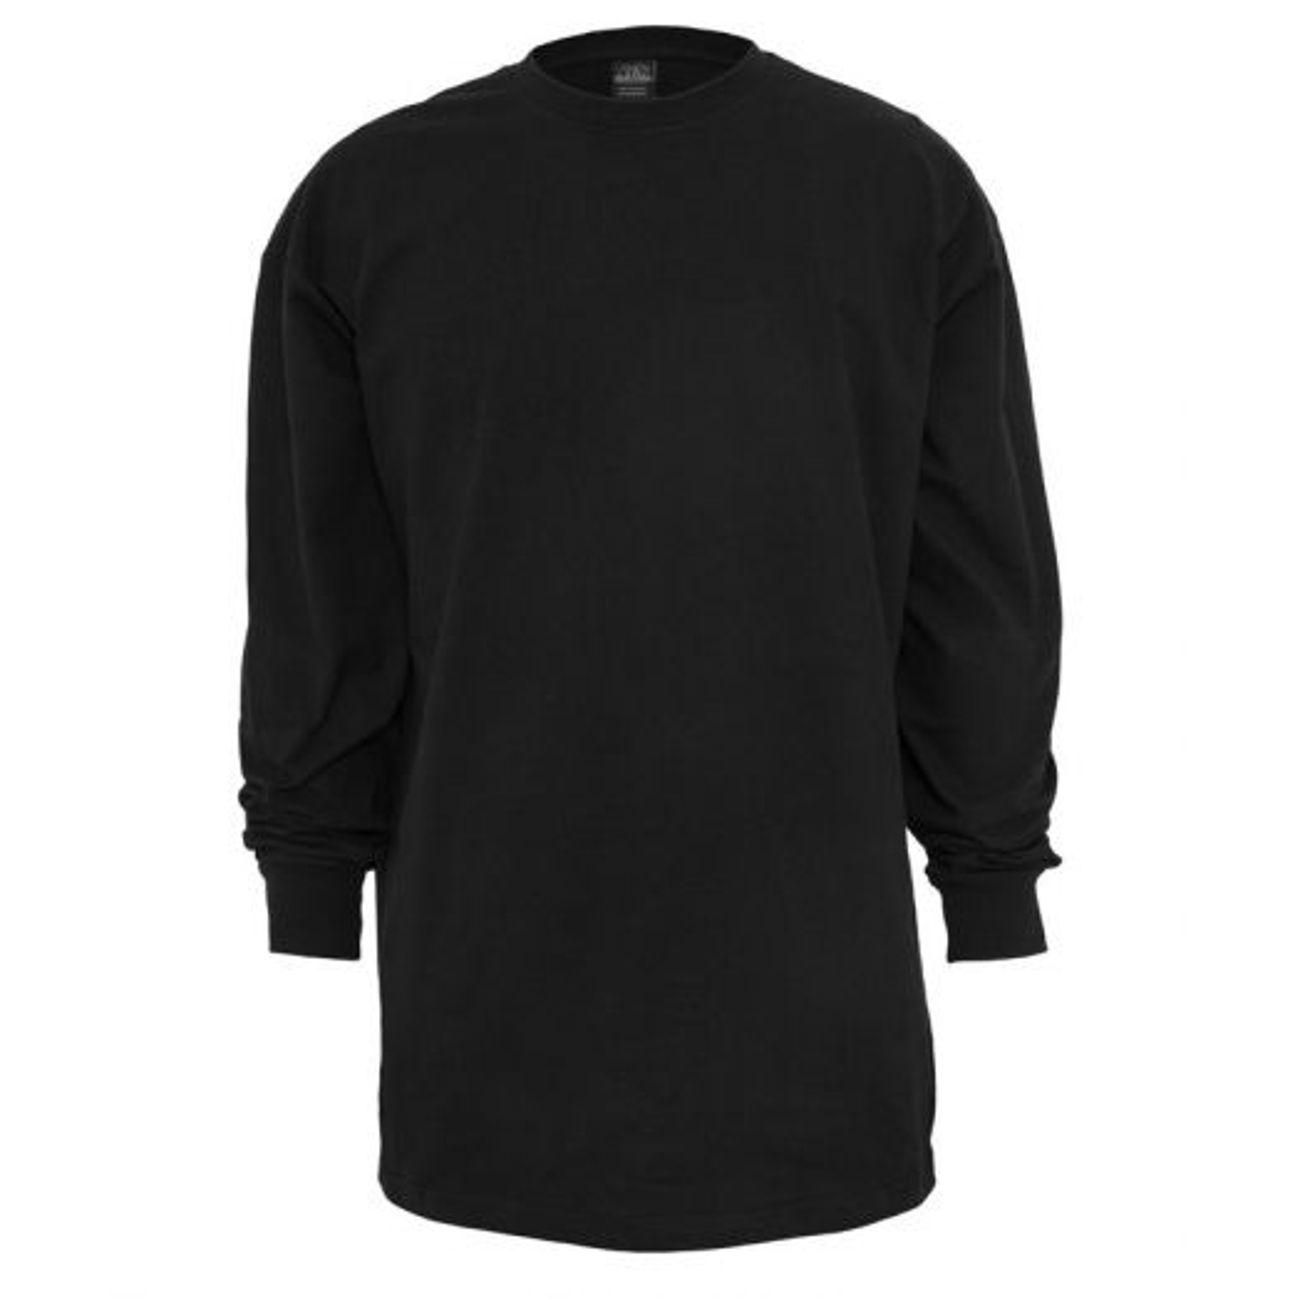 ... Mode- Lifestyle adulte URBAN CLASSICS Tee-shirt manches longues URBAN  CLASSICS extra long Noir ... 088b4145158d